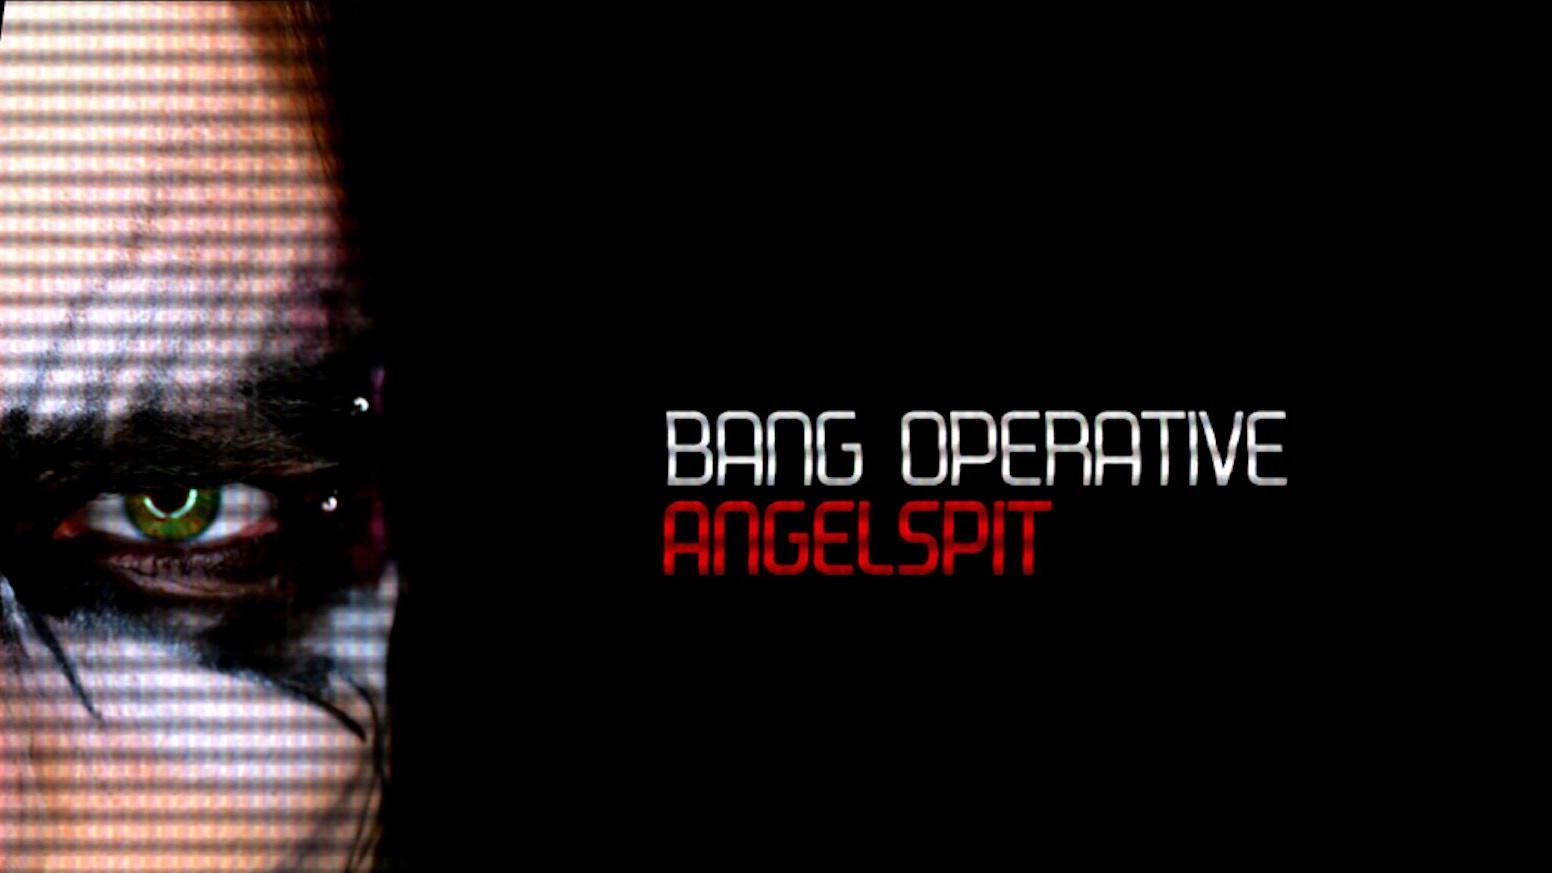 BANG OPERATIVE by ANGELSPIT — Kickstarter